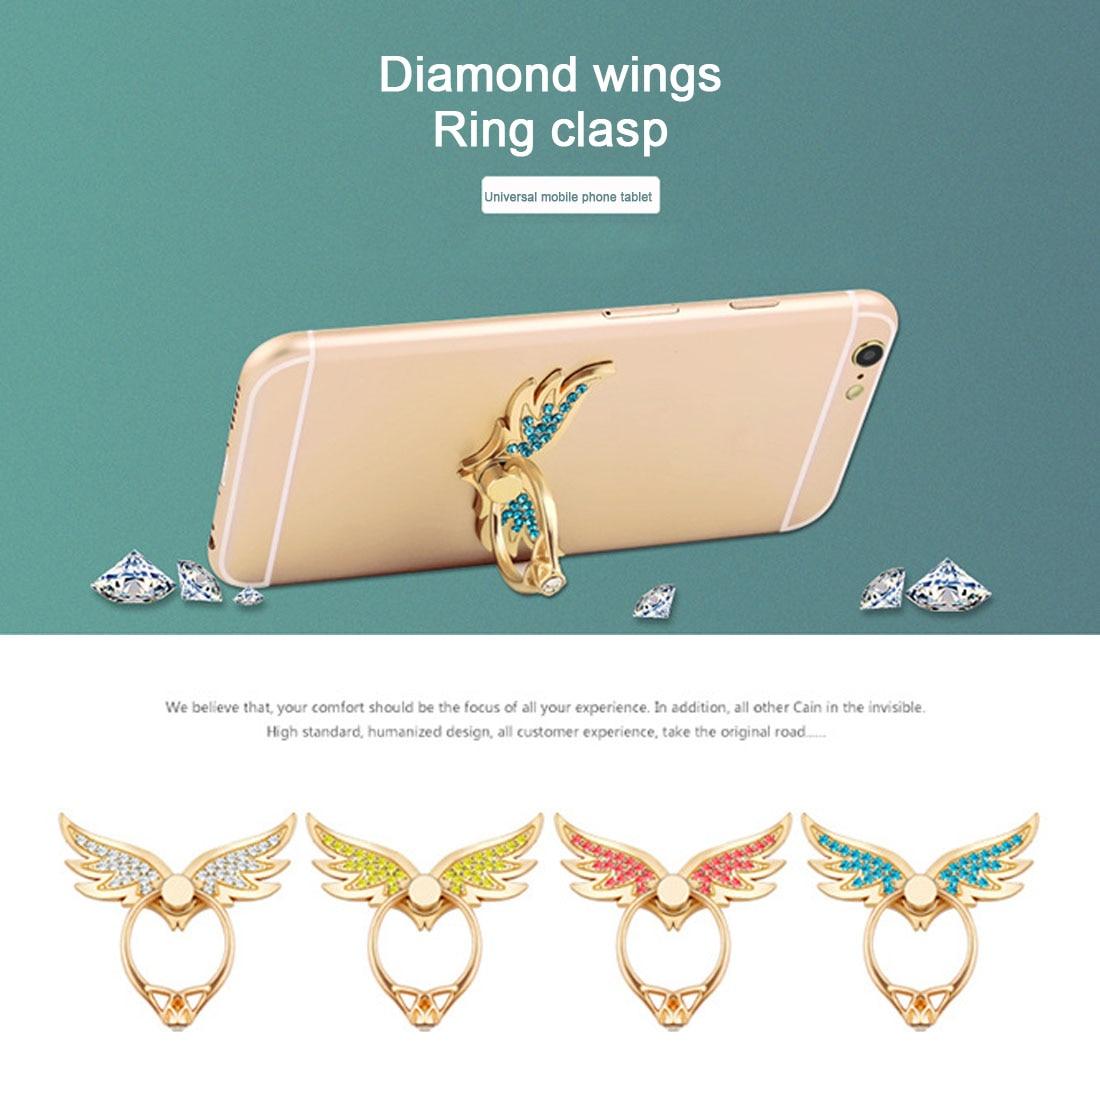 Etmakit Hot Angel Wings Fashion 360 Degree Multi-function Metal Finger Ring Mobile Phone Ring Holder For iPhone Samsung Mobile